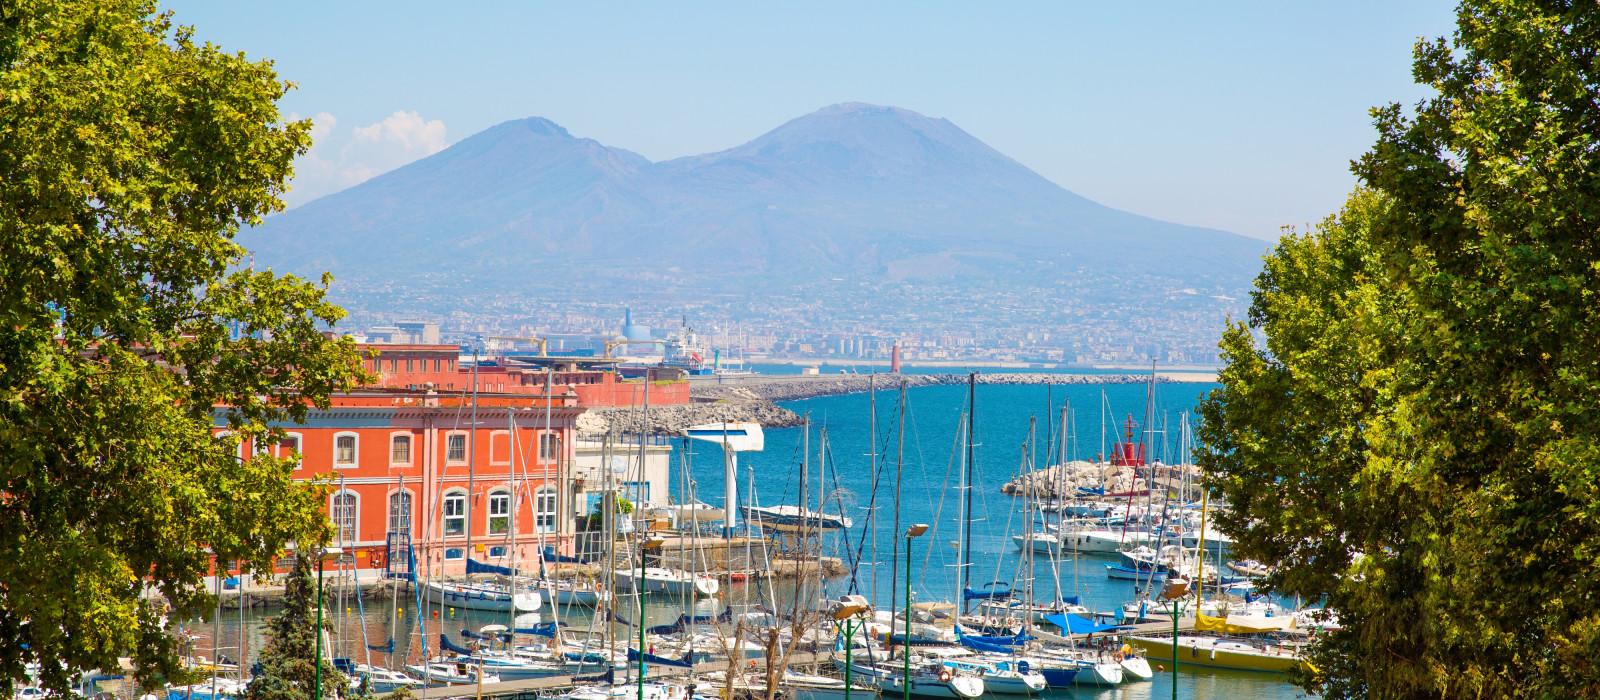 Destination Naples Italy